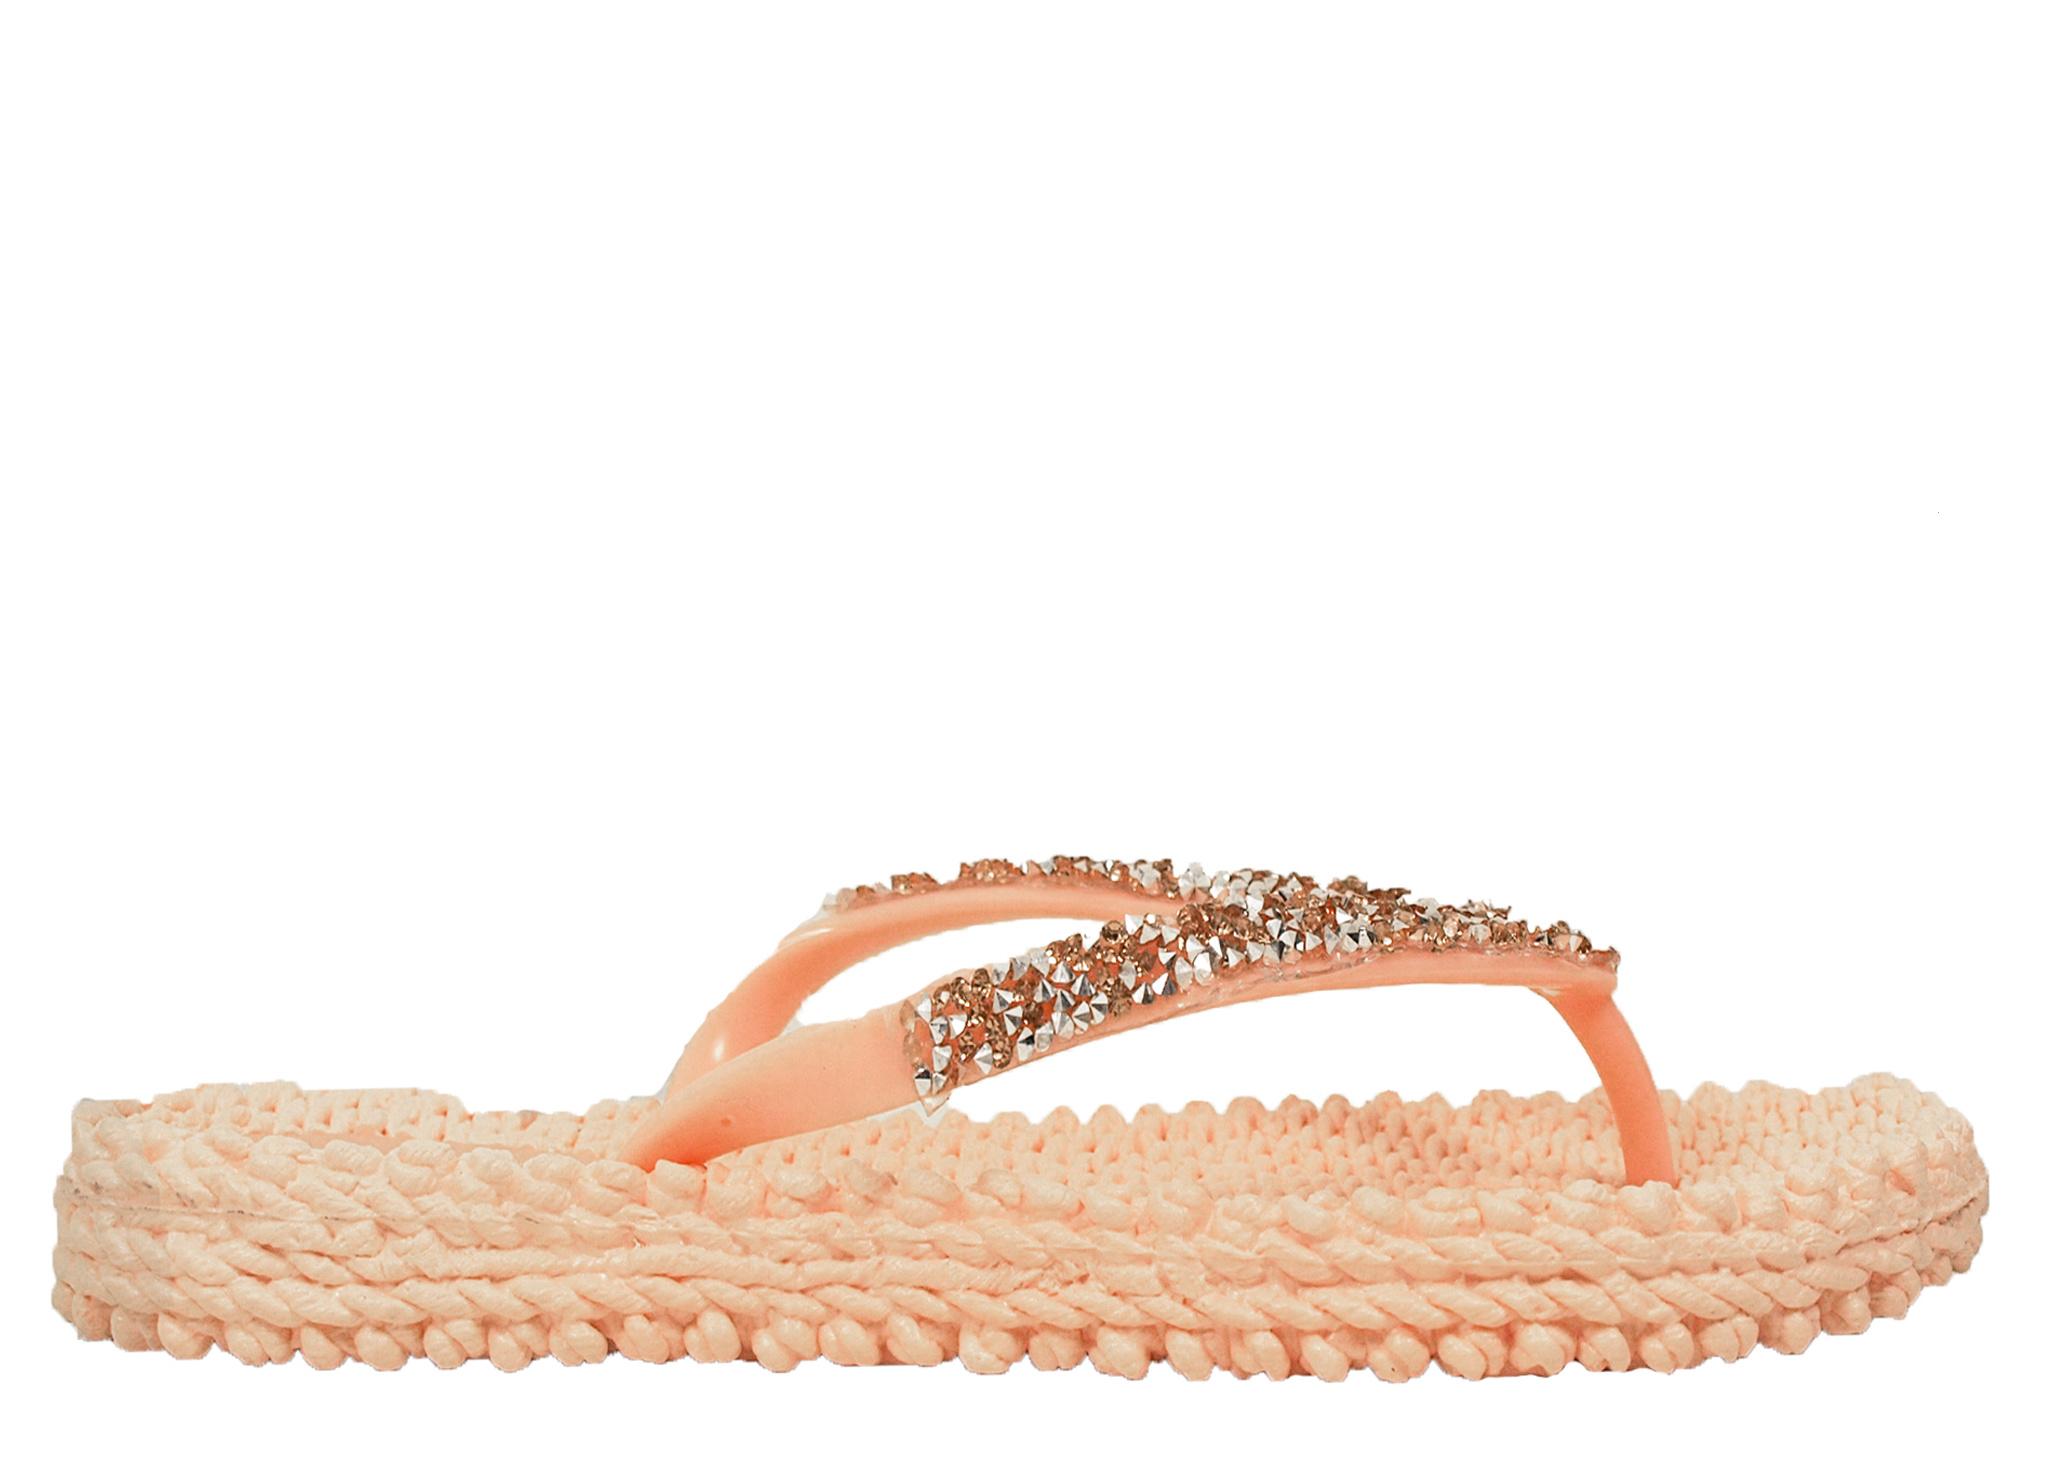 ILSE JACOBSEN  Ilse Jacobsen Slipper Cheerful03 Soft Coral